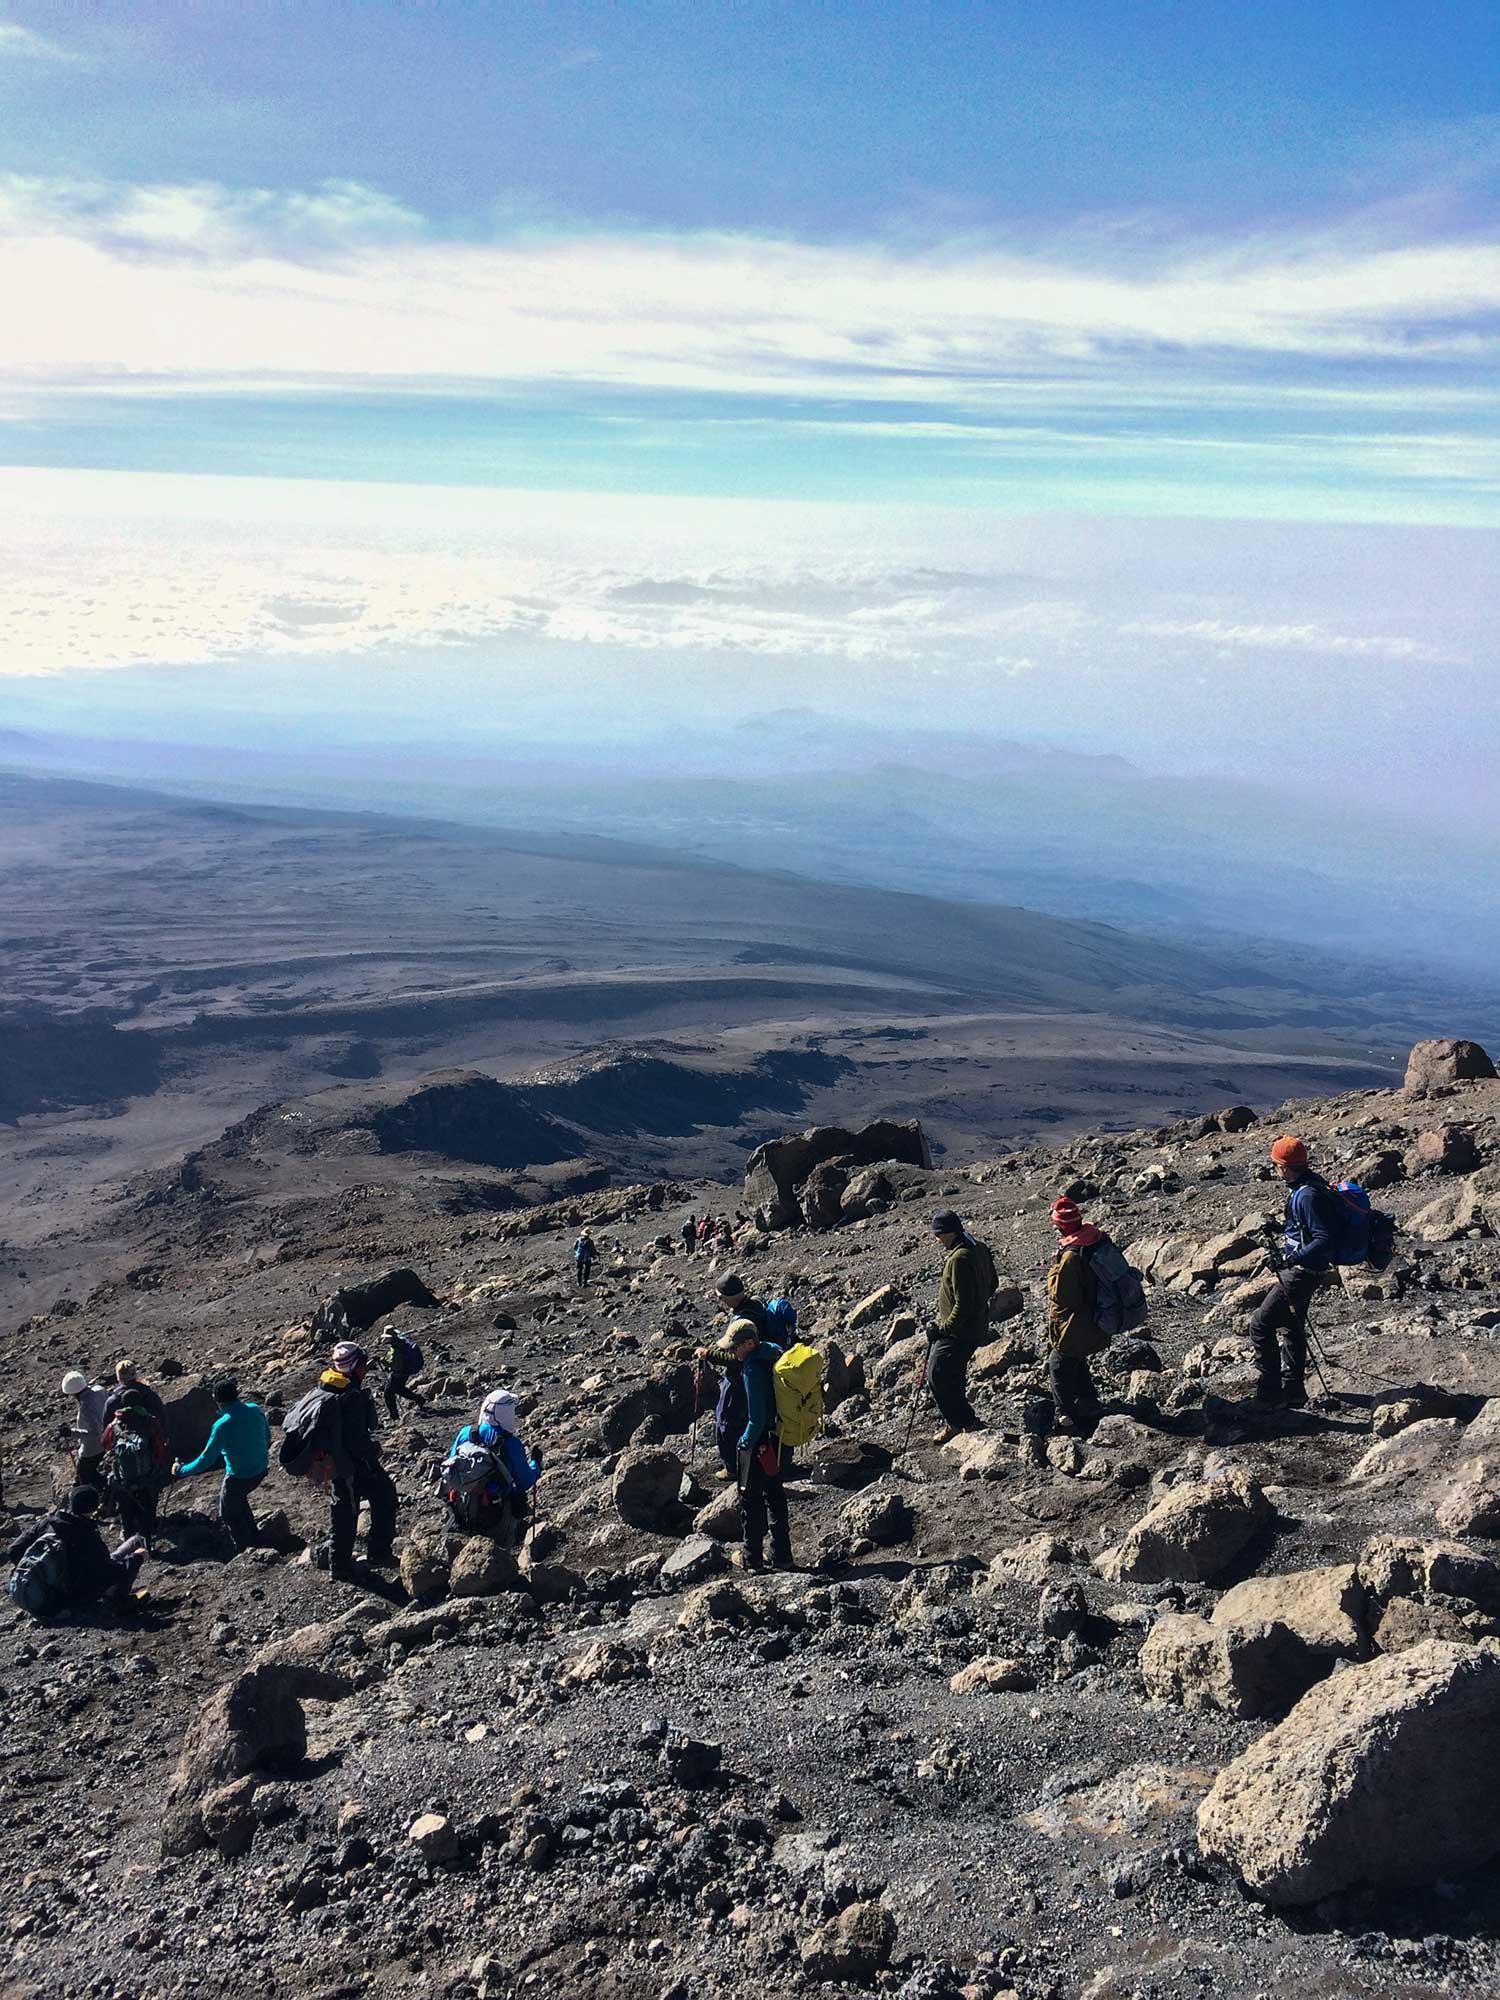 Kilimanjaro climbers descending to Barufu Camp via switchbacks.